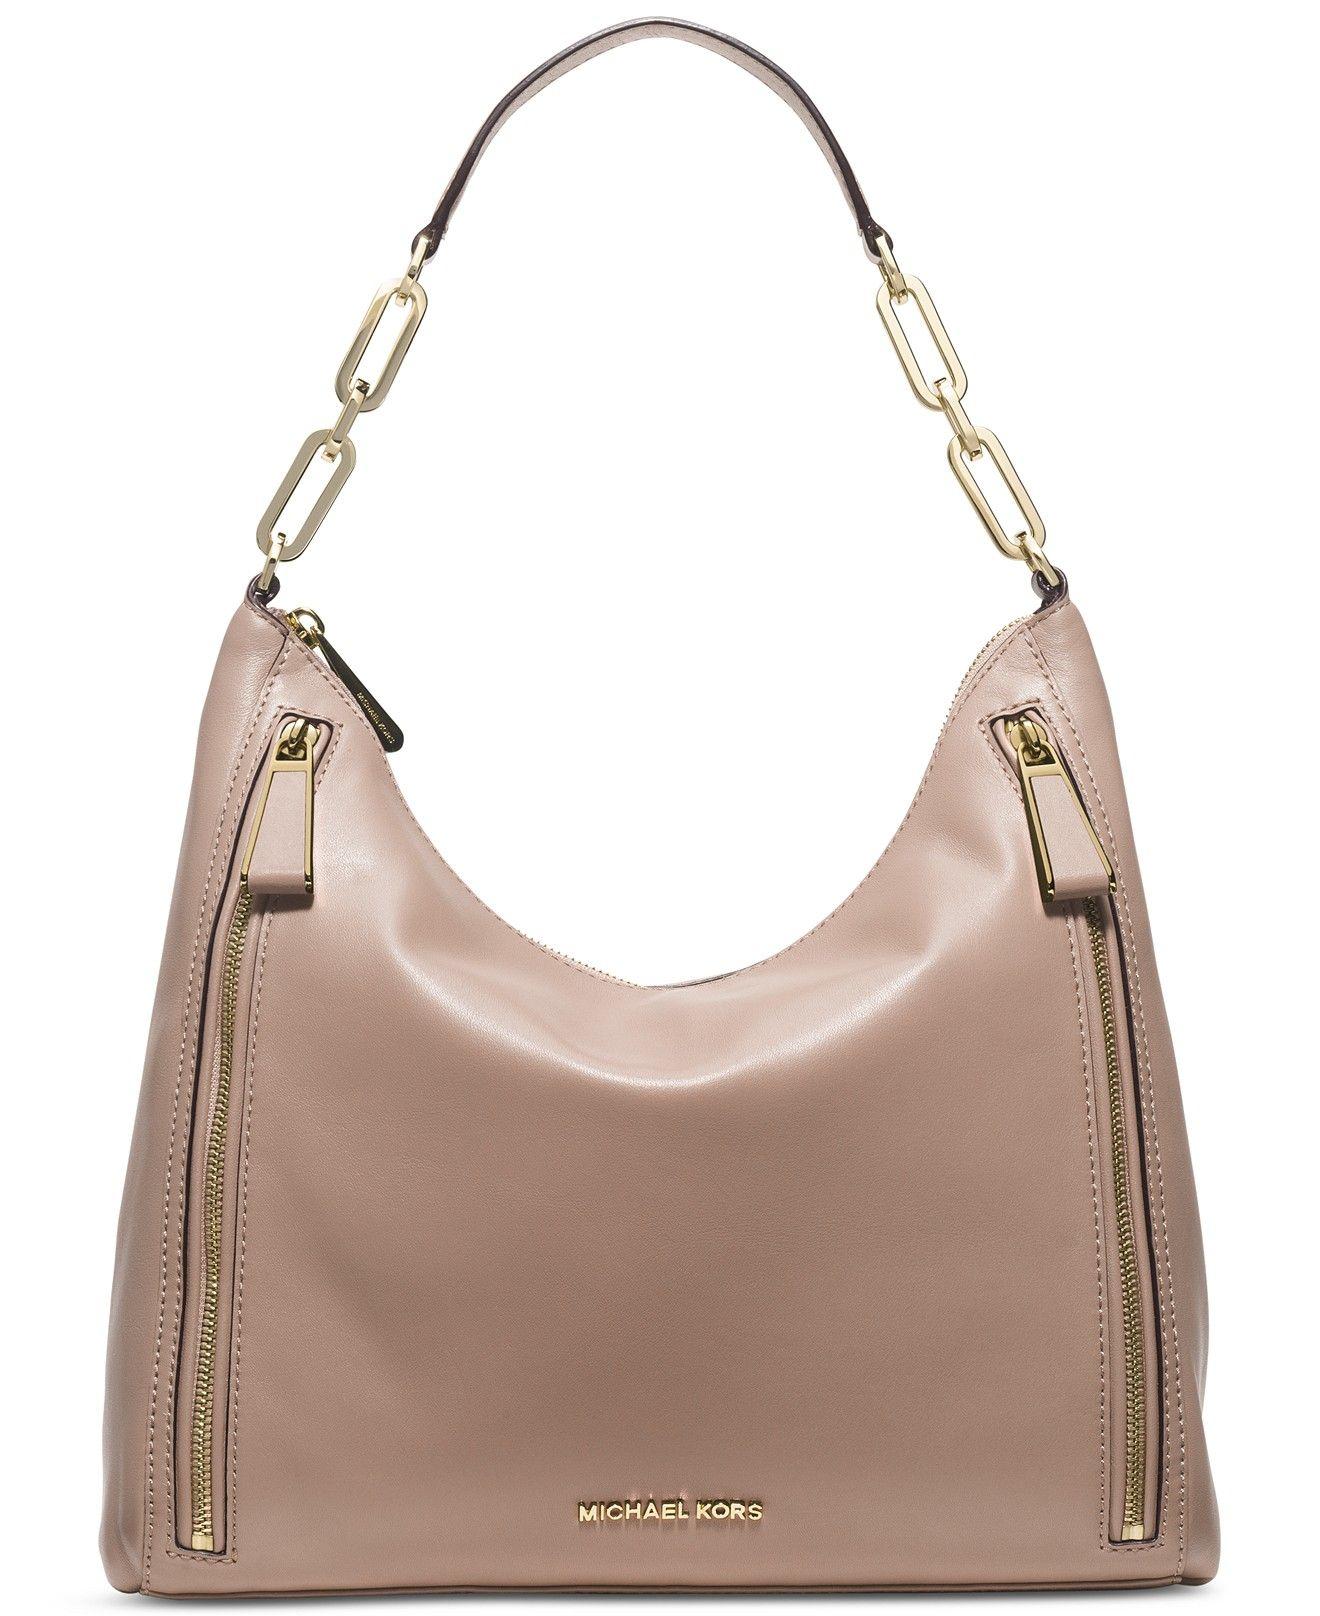 MICHAEL Michael Kors Matilda Large Shoulder Bag - Sale \u0026 Clearance -  Handbags \u0026 Accessories -